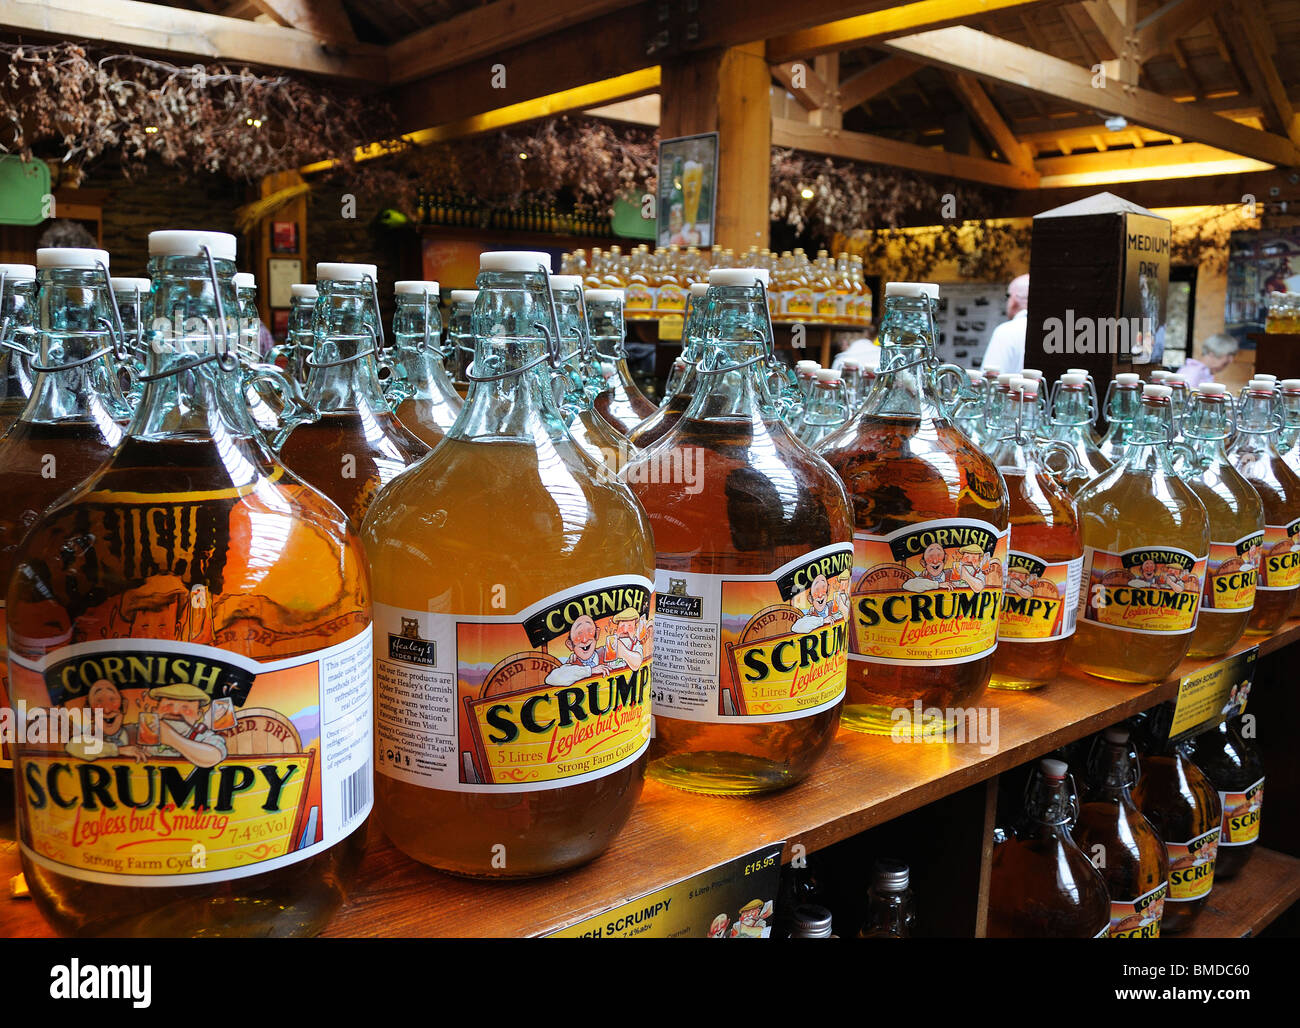 flagons of cornish scrumpy cider for sale in a farm shop near truro,cornwall,uk - Stock Image